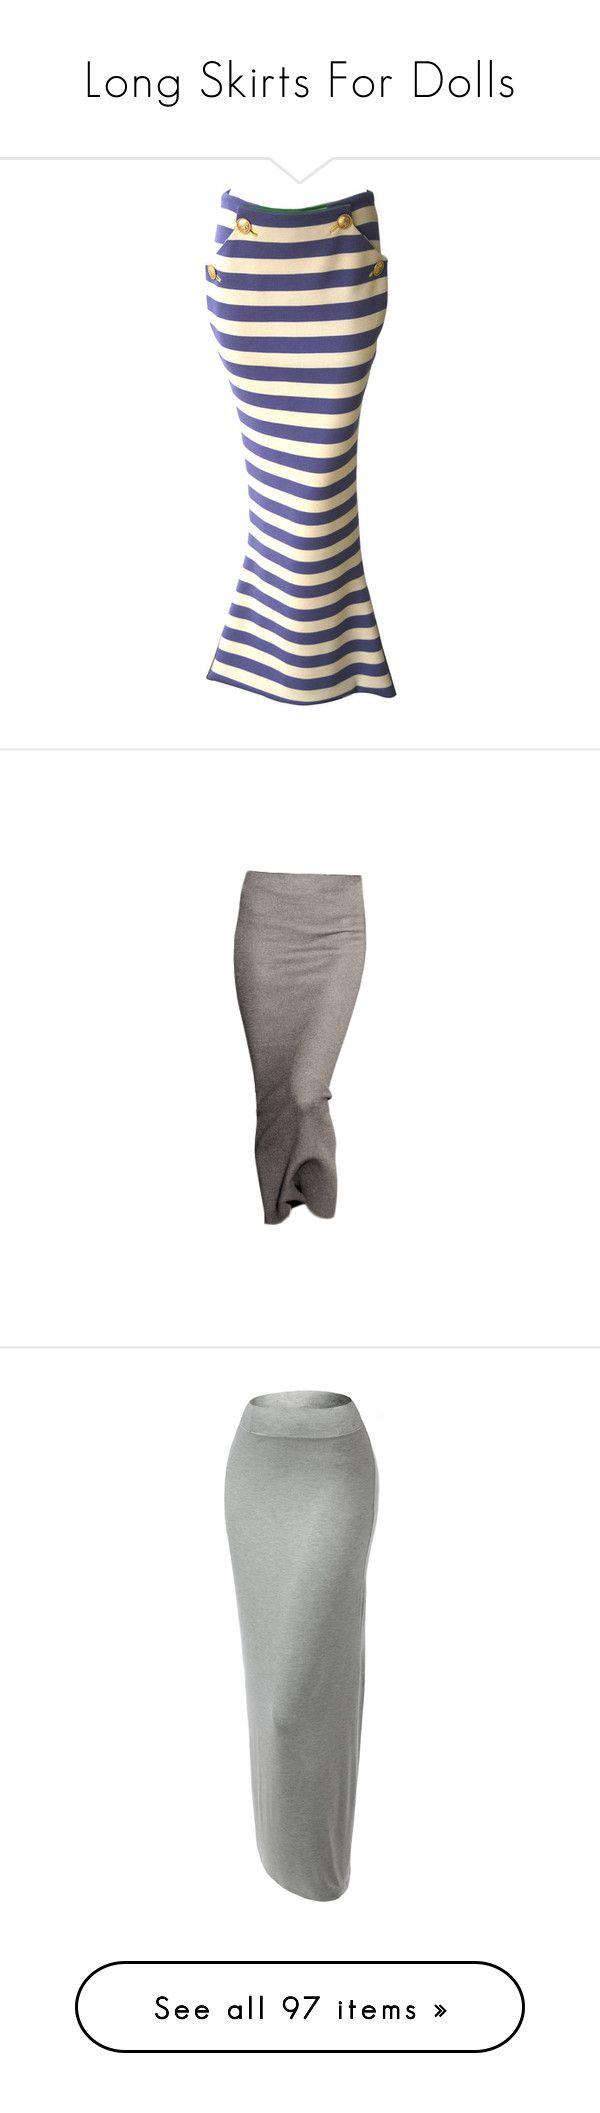 """Long Skirts For Dolls"" by nikki-kersey ❤ liked on Polyvore featuring skirts, nautical skirt, versace skirt, cream skirt, versace, wool jersey, bottoms, brown skirt, maxi skirt and jersey foldover maxi skirt"